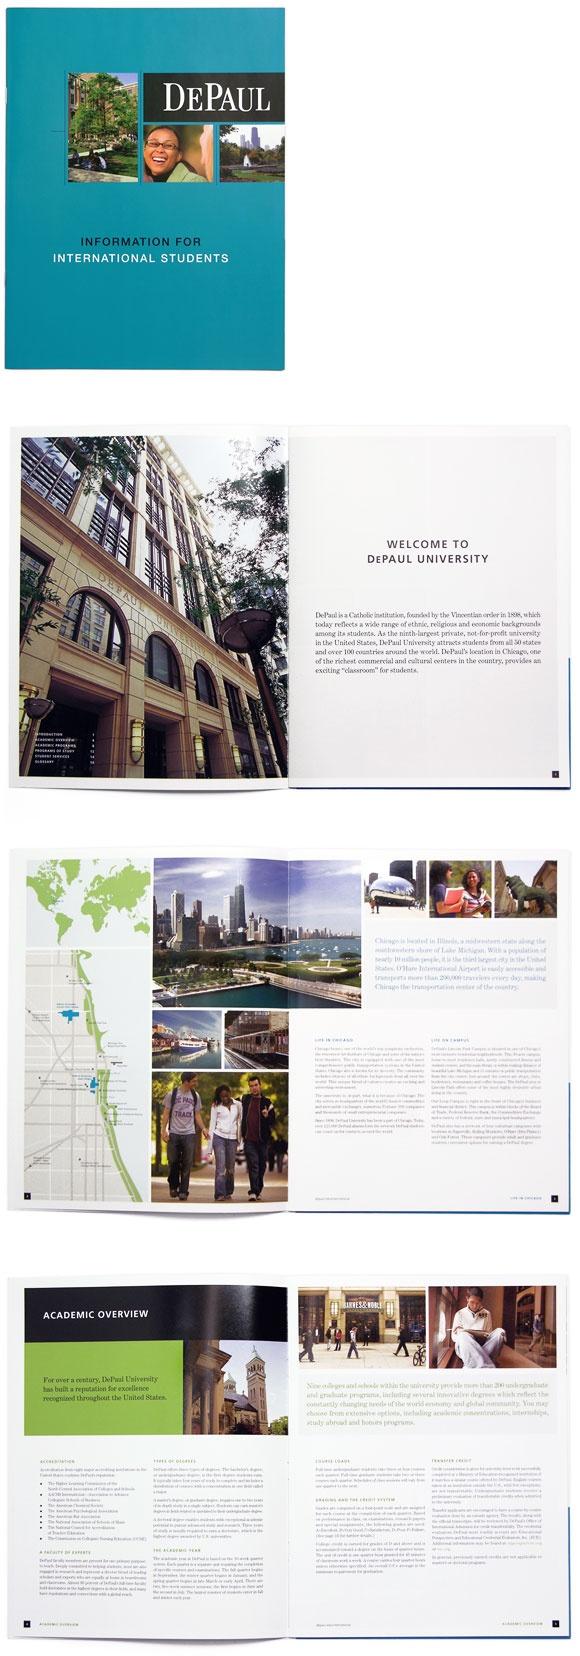 Color printing depaul - Horizontal Picture Packaging